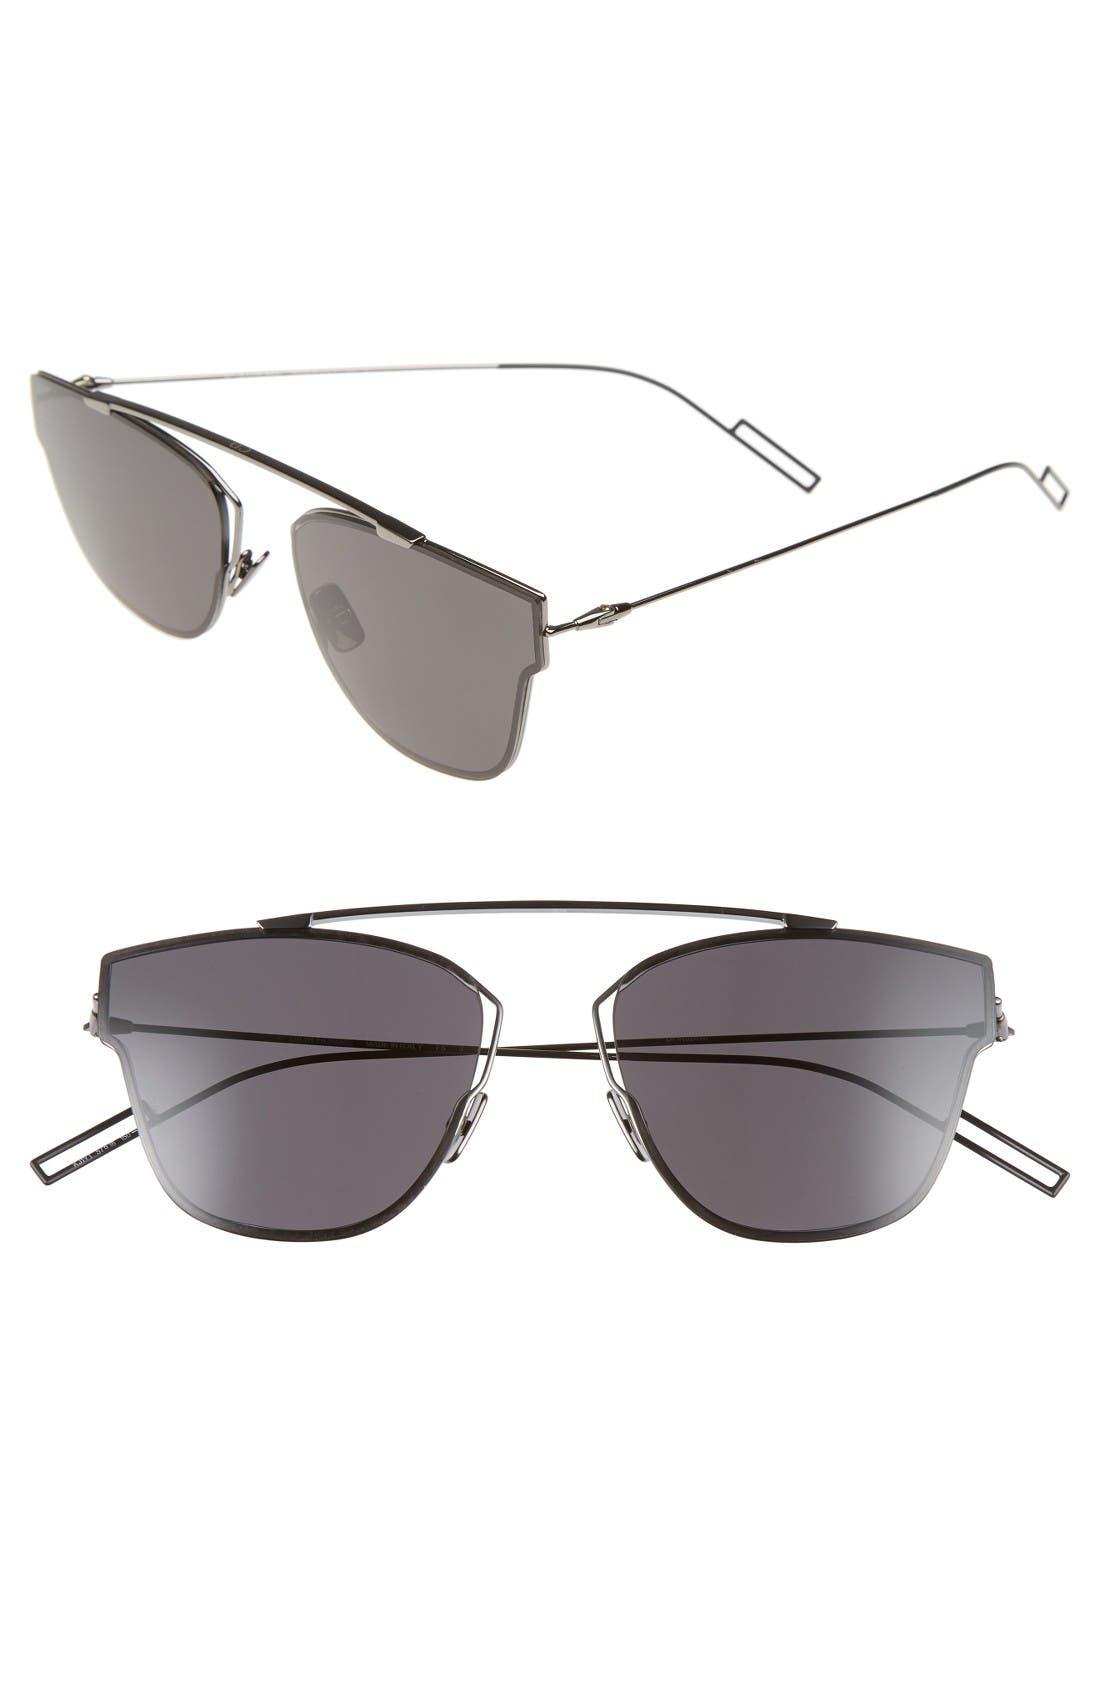 Dior Homme 57mm Semi Rimless Sunglasses